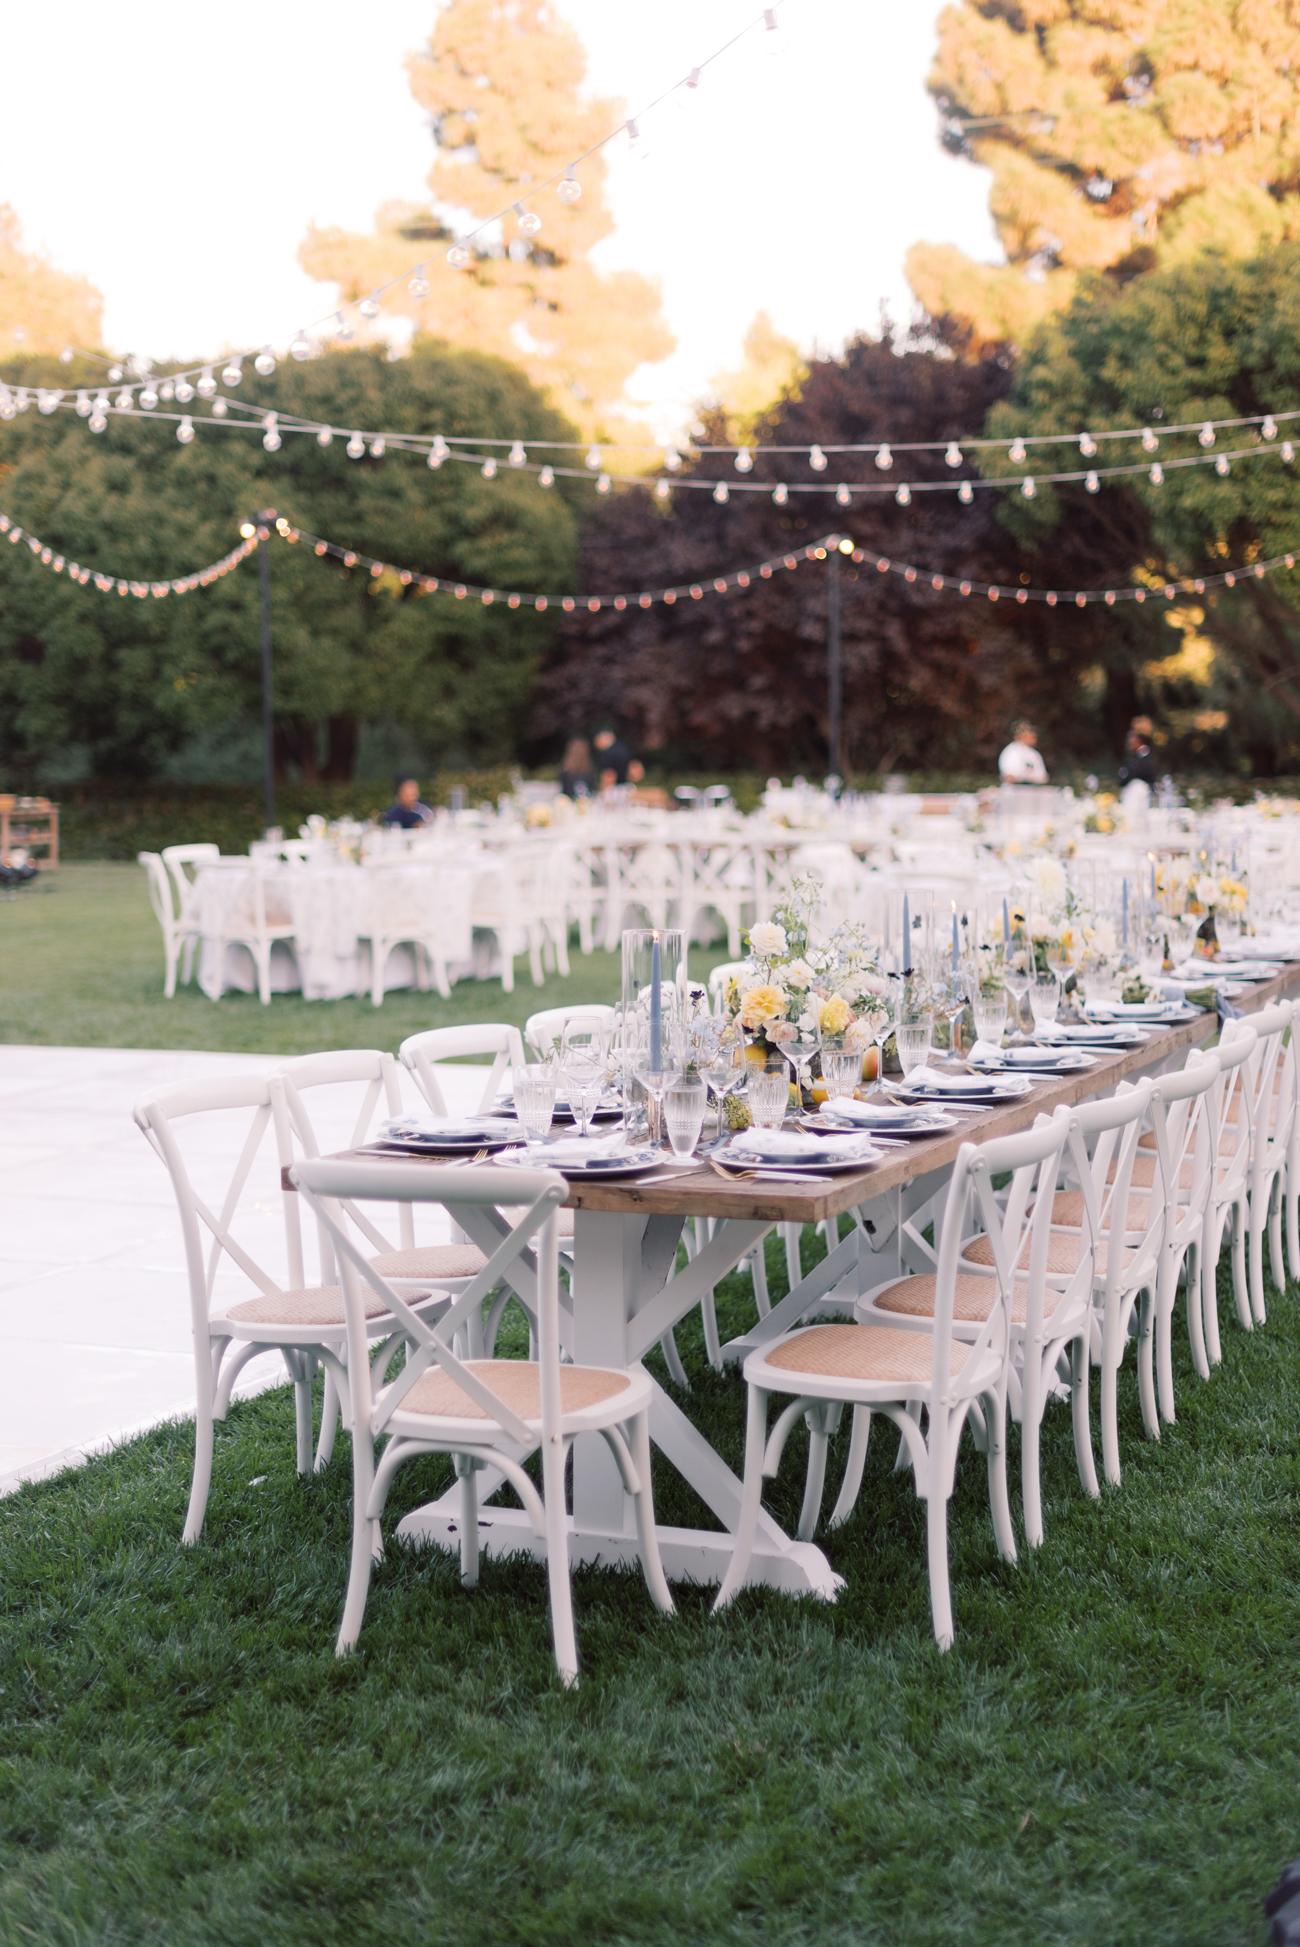 wooden table string light outside wedding reception setup